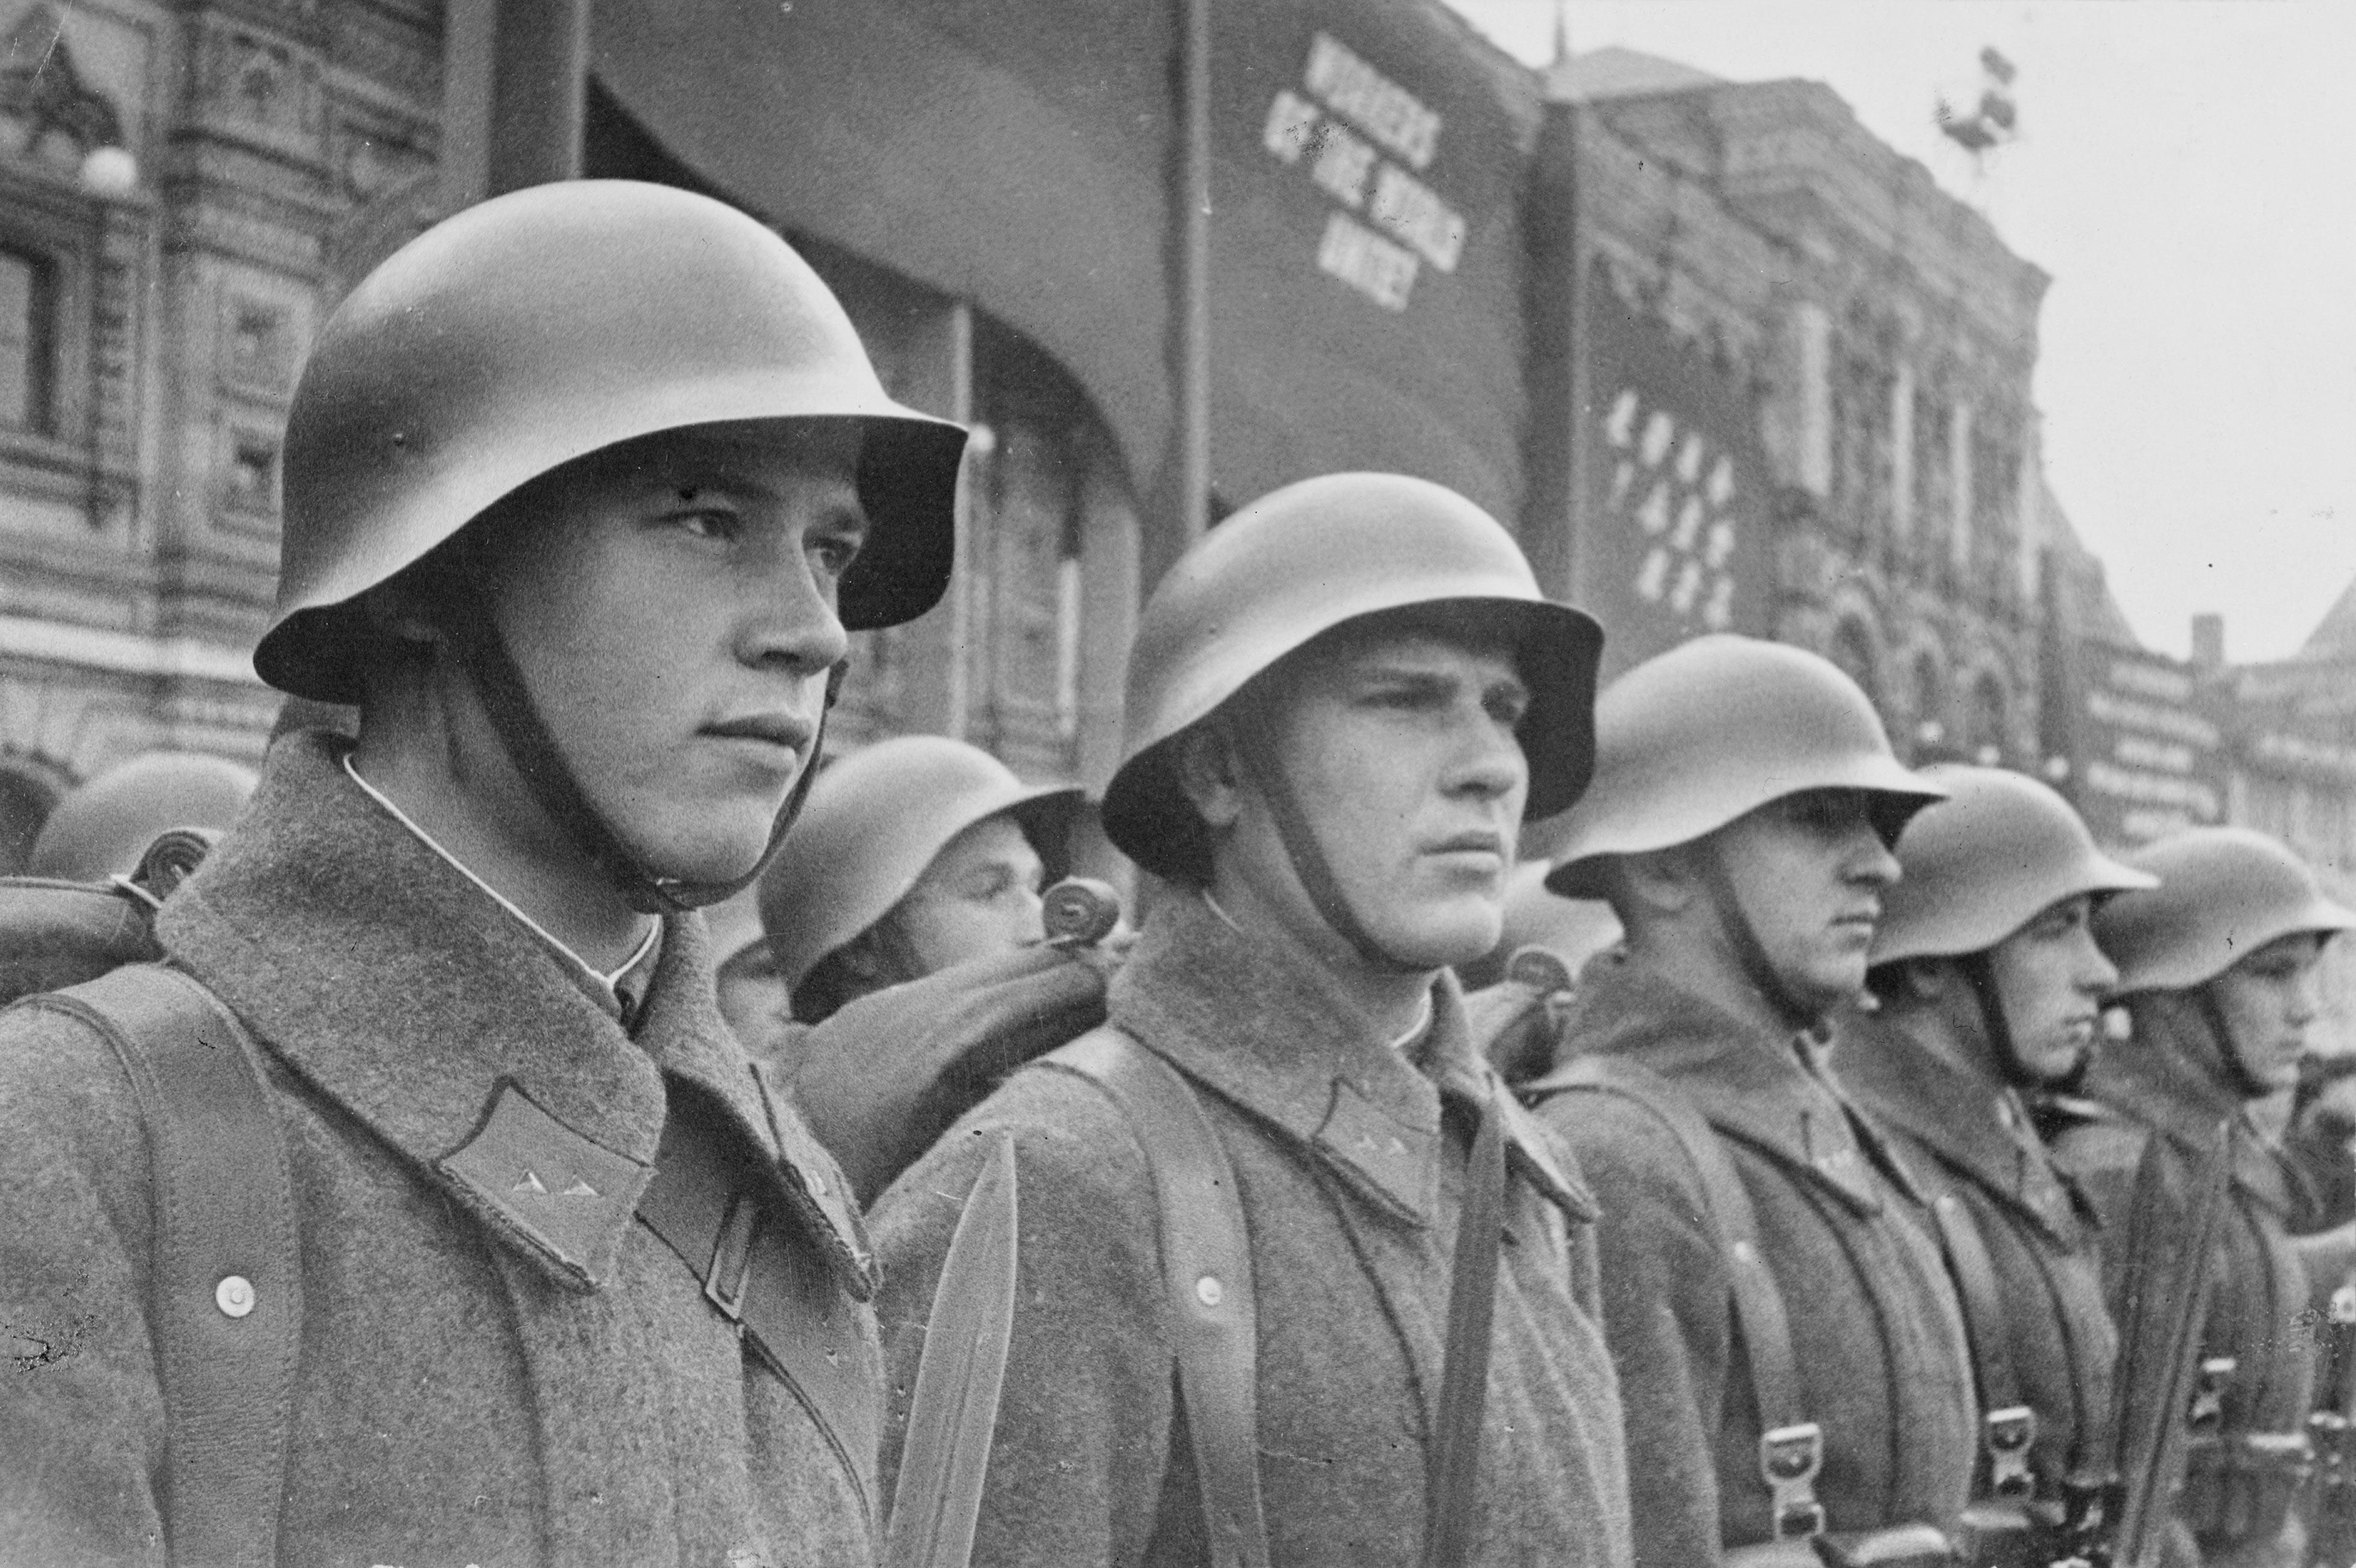 http://russian7.ru/wp-content/uploads/2015/02/Soldaten_rote_armee.jpg